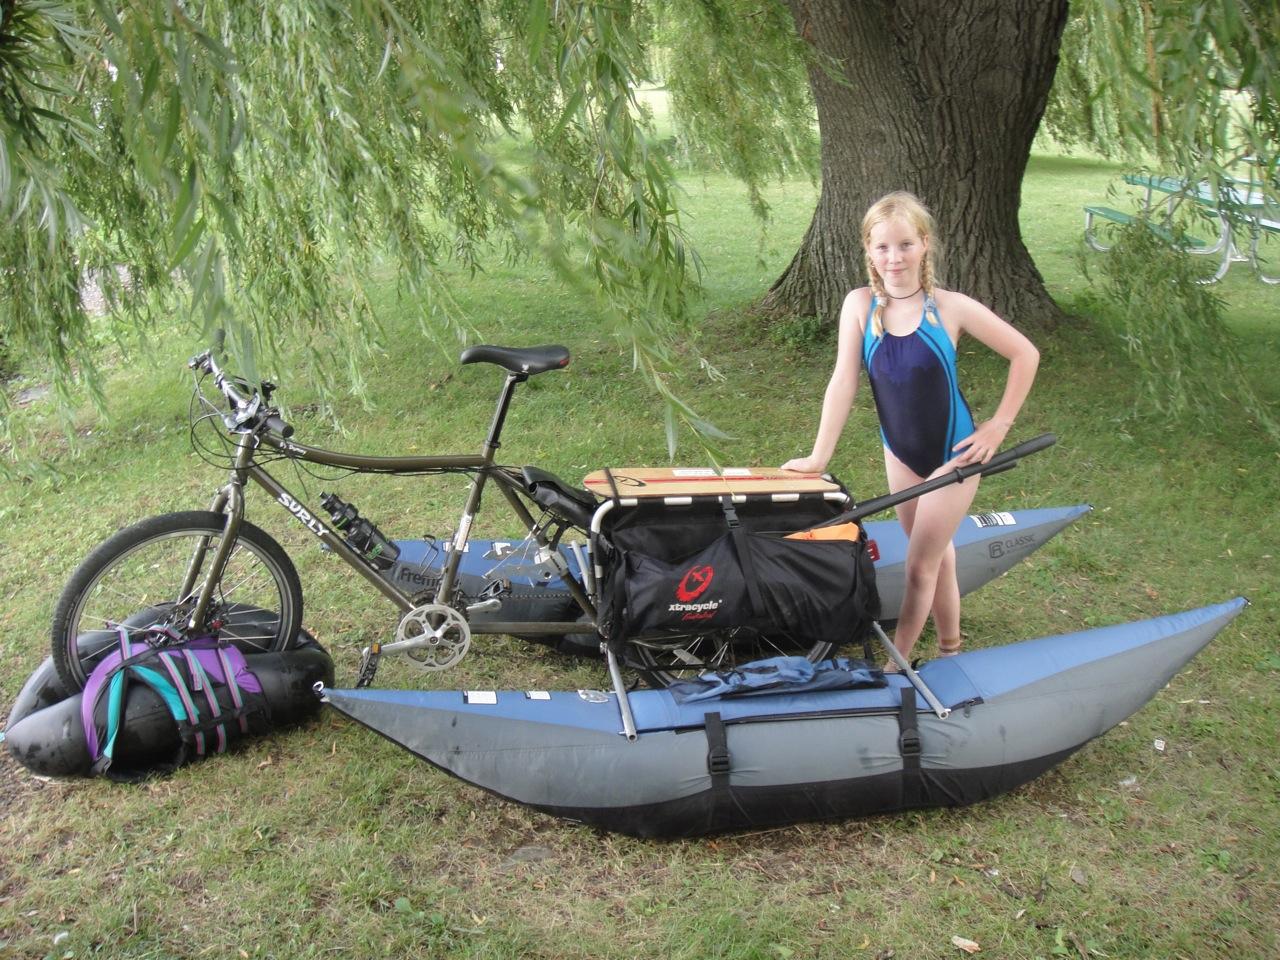 Aqua Xtracycle The Amphibious Bicycle Bikes As